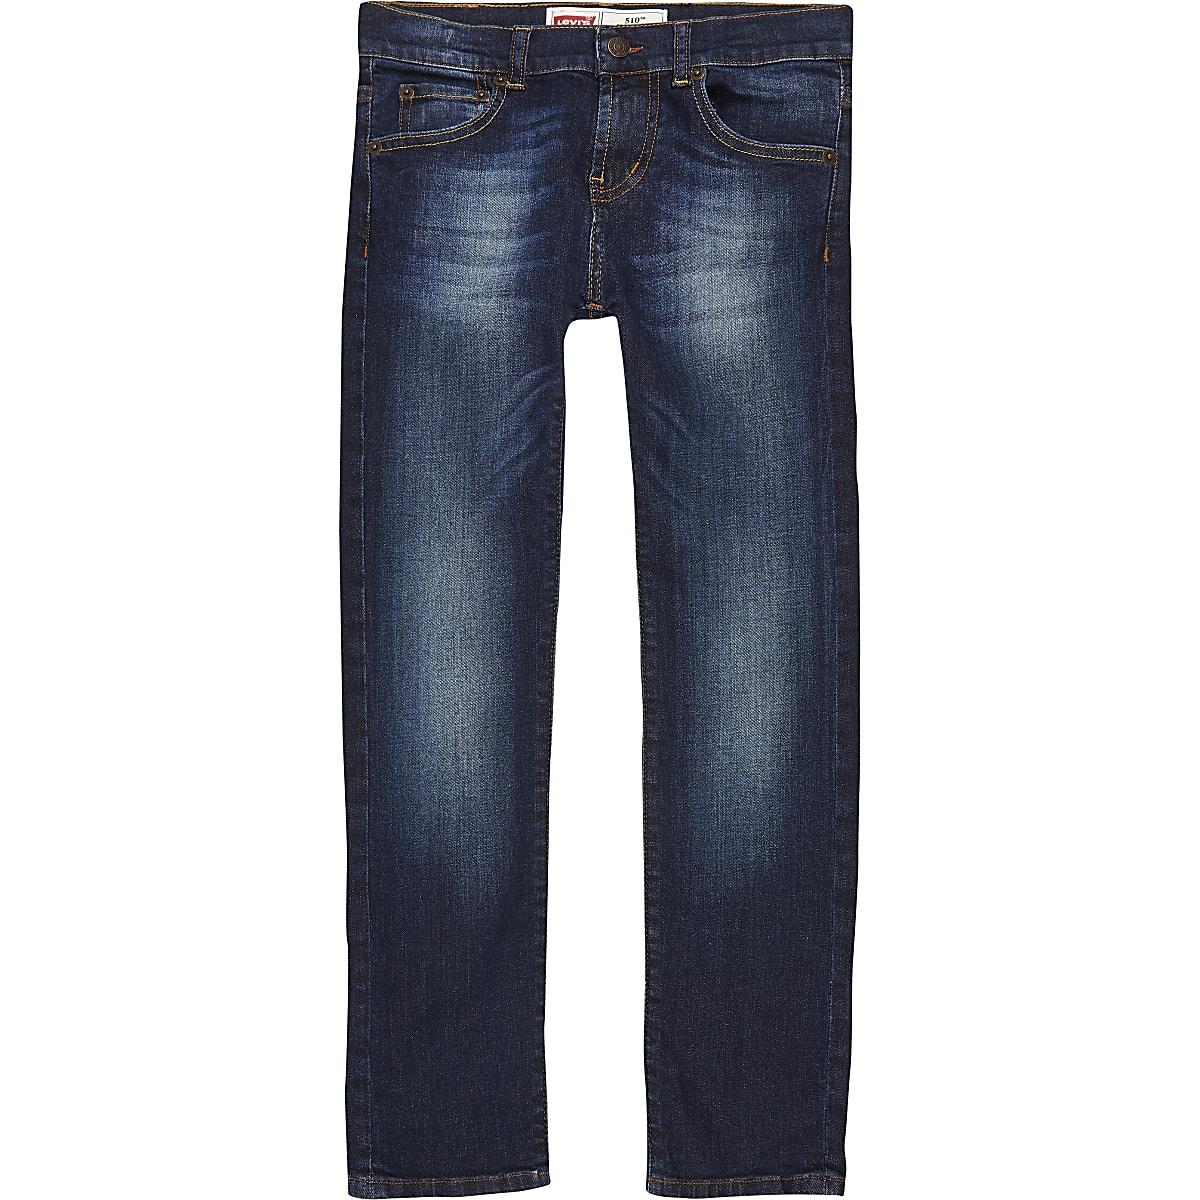 b7e56e25ad178d Boys dark blue Levi's skinny fit jeans - Skinny Jeans - Jeans - boys